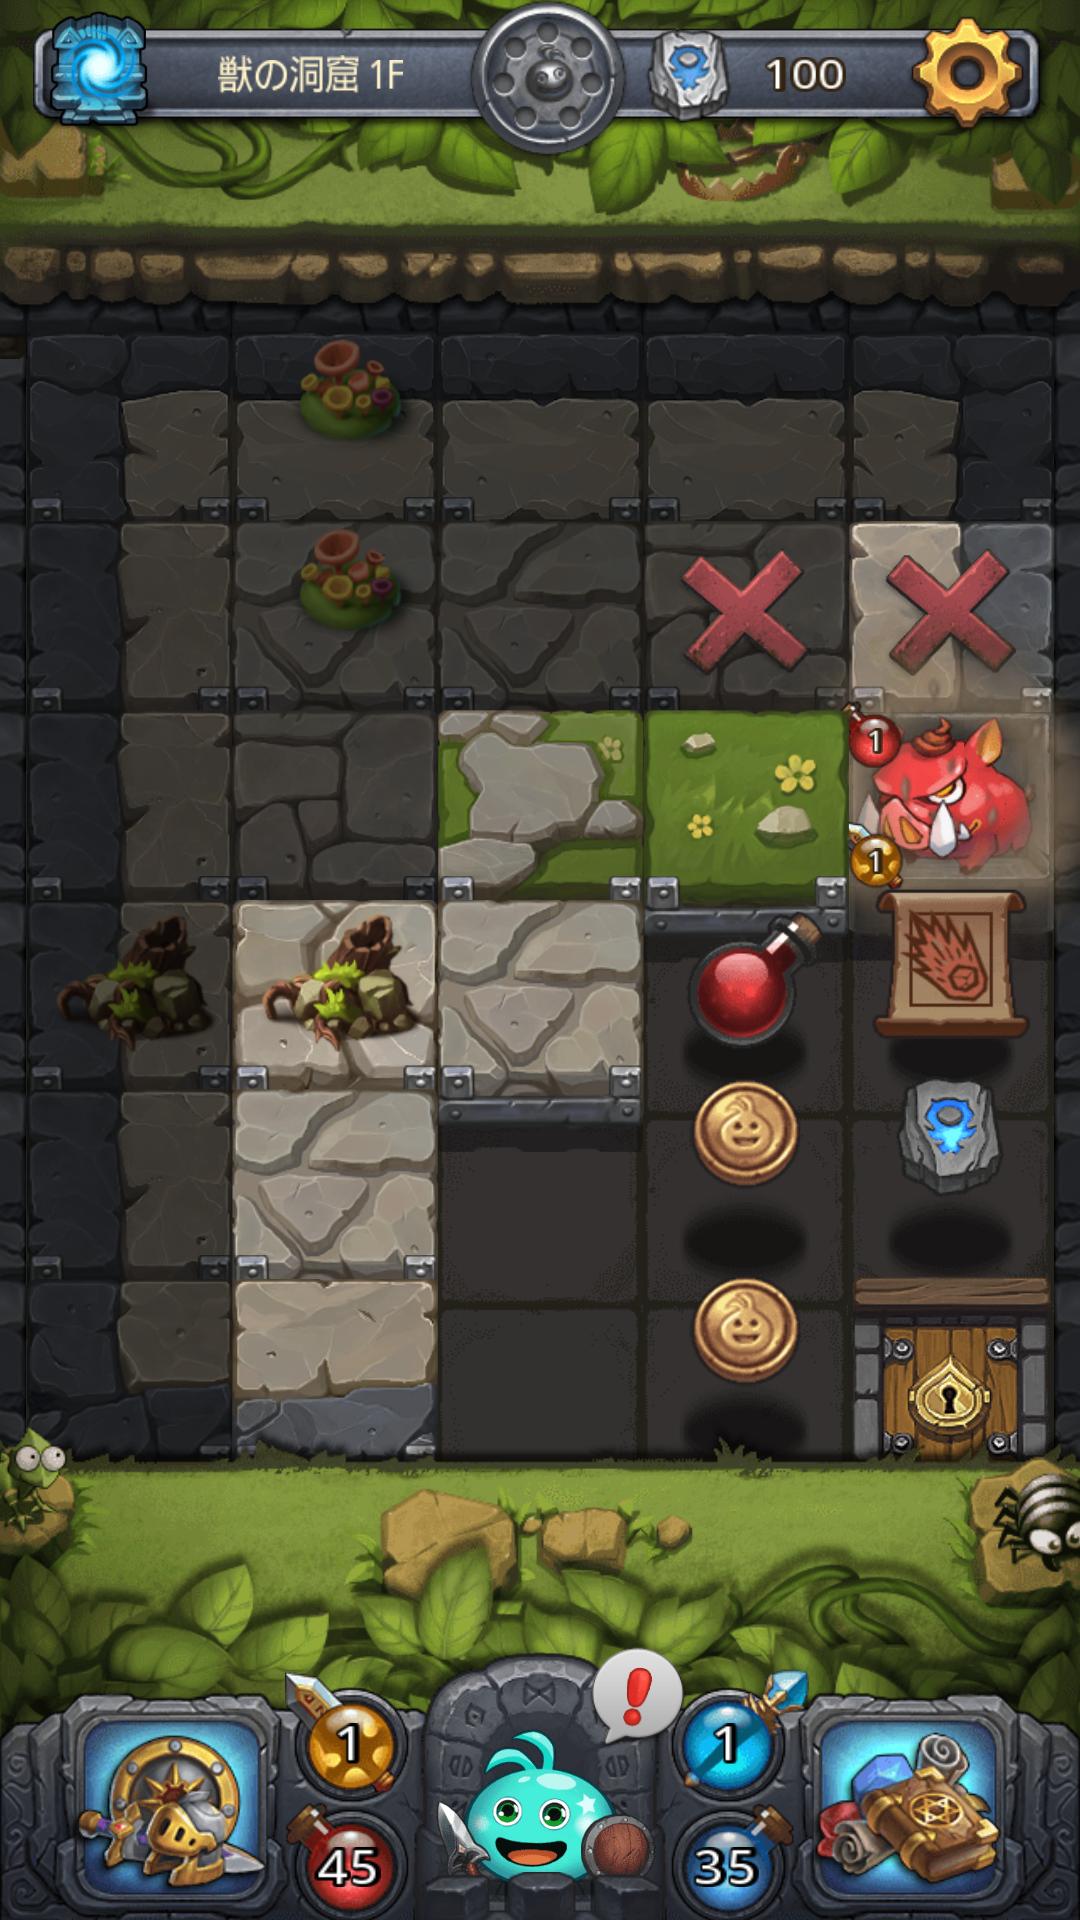 androidアプリ ダンジョンズ&ガンボル(Gumballs & Dungeons)攻略スクリーンショット3